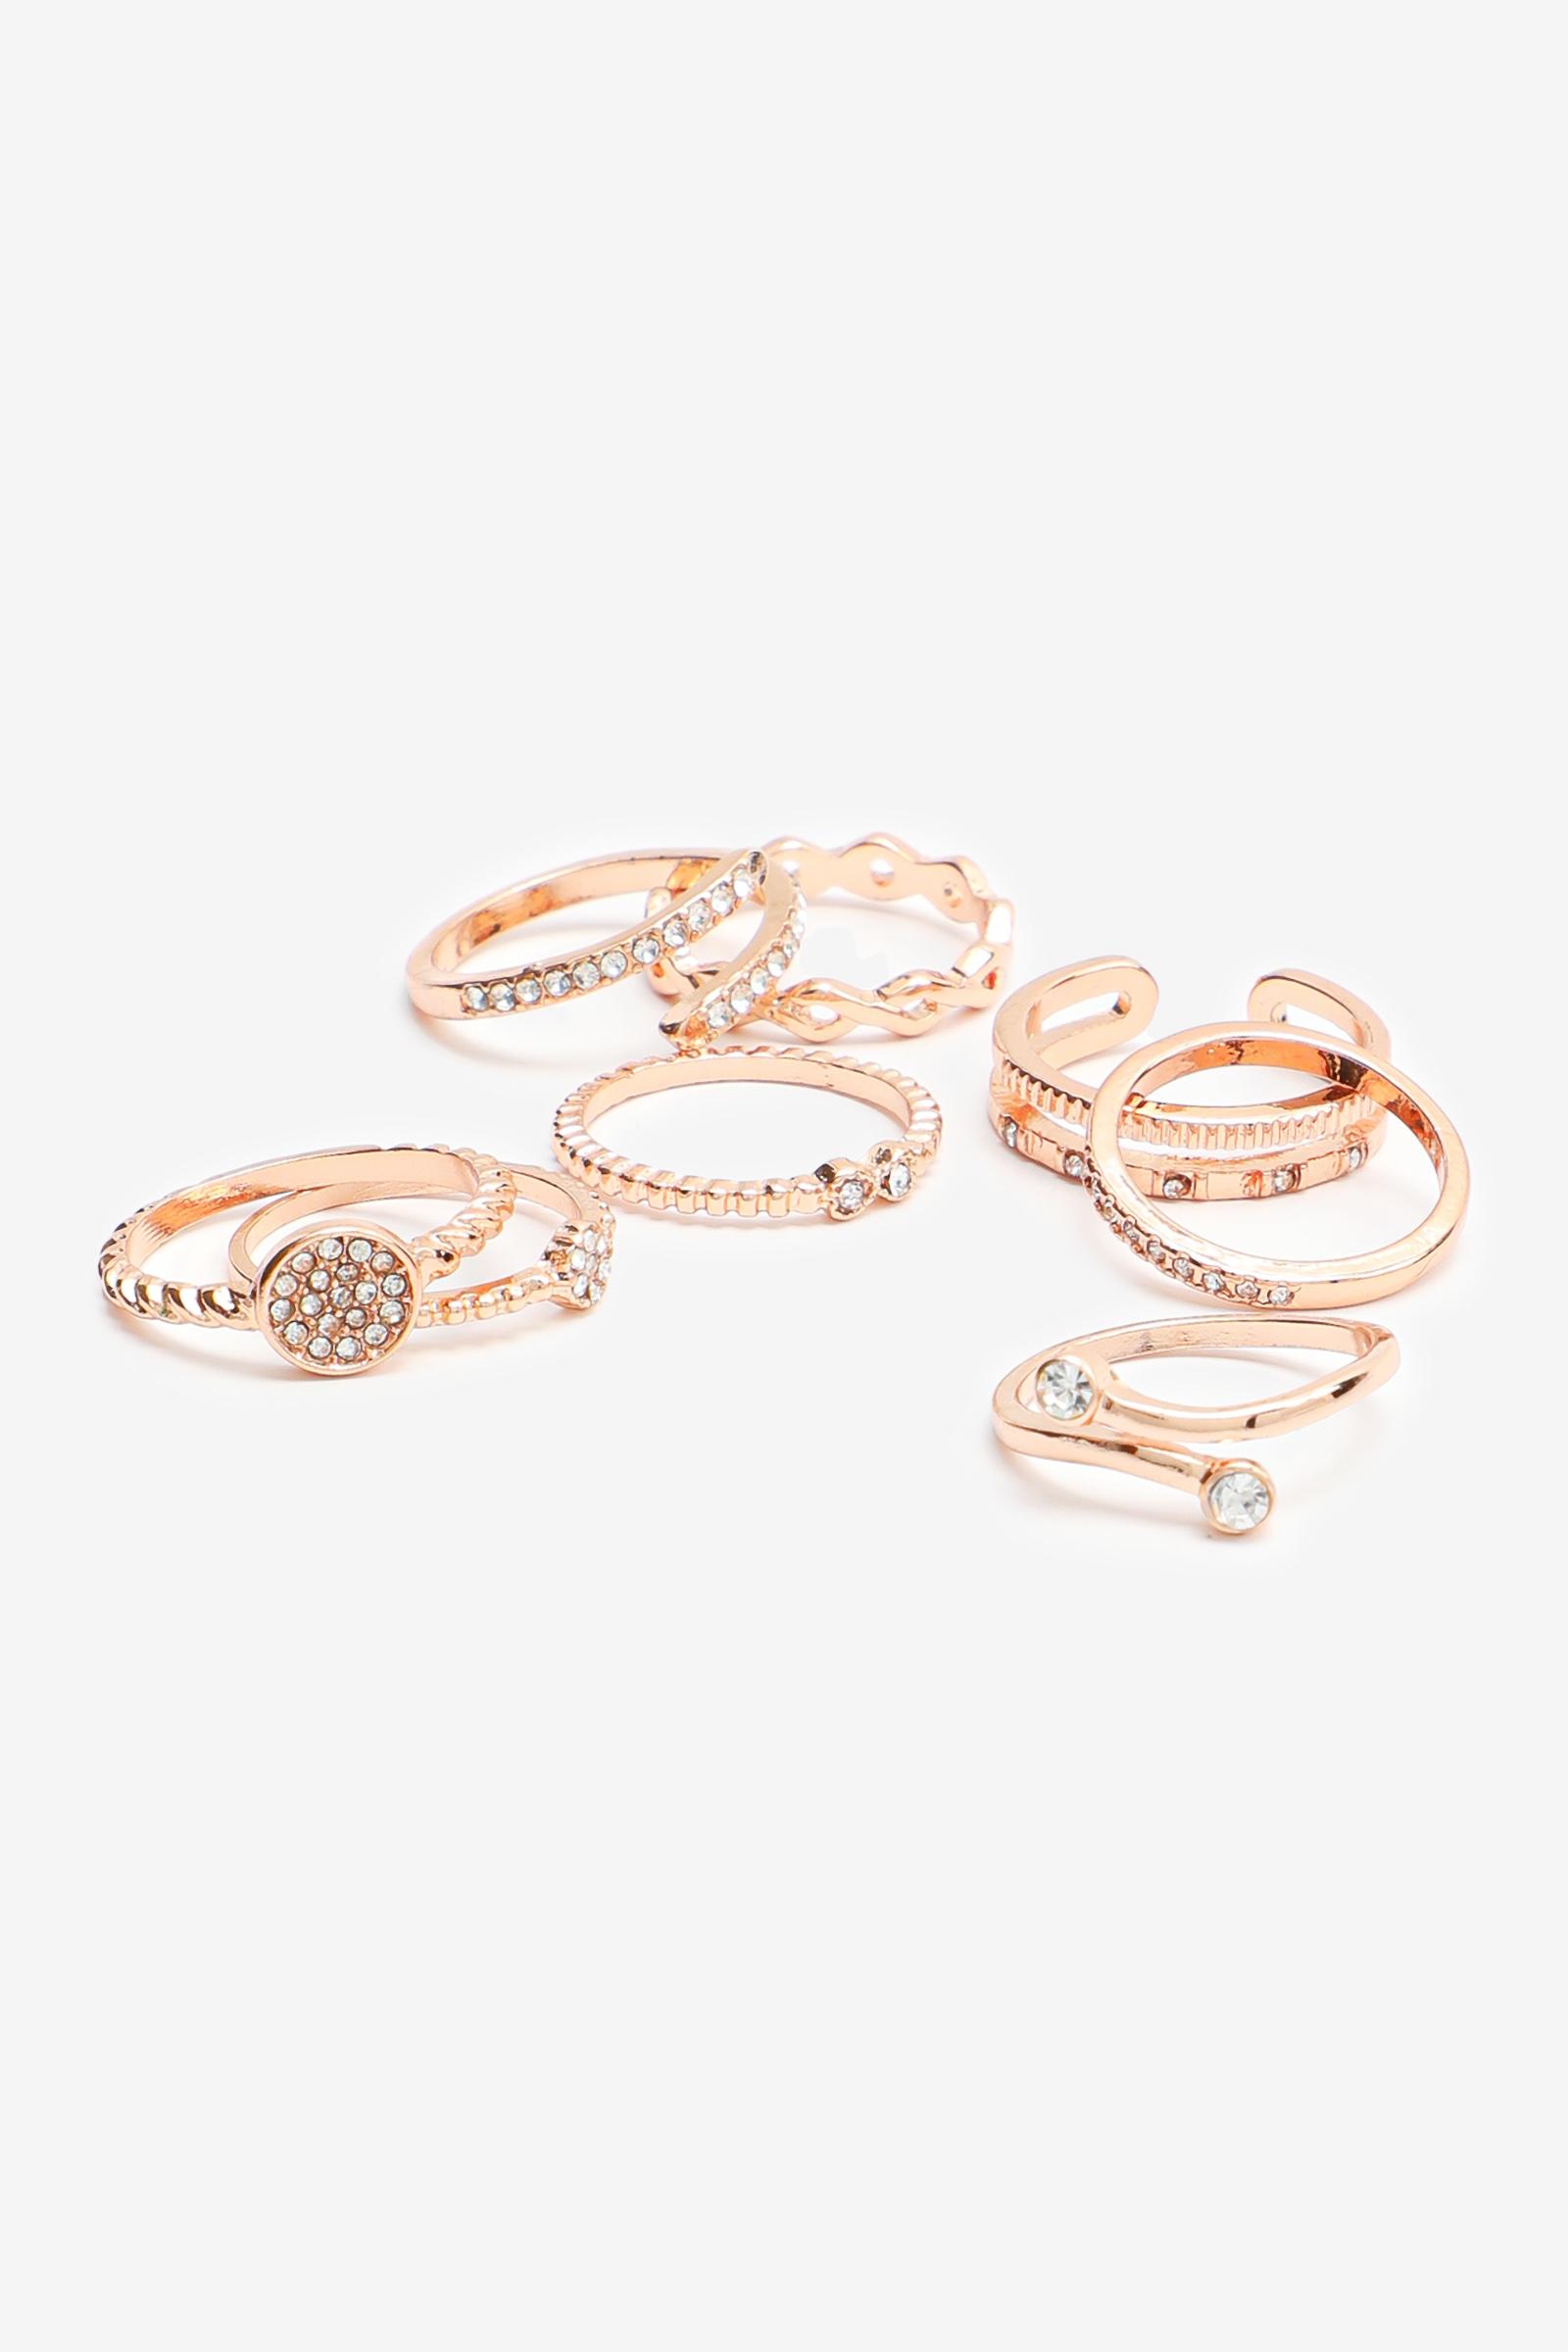 Pack of Vintage Rose Gold Rings